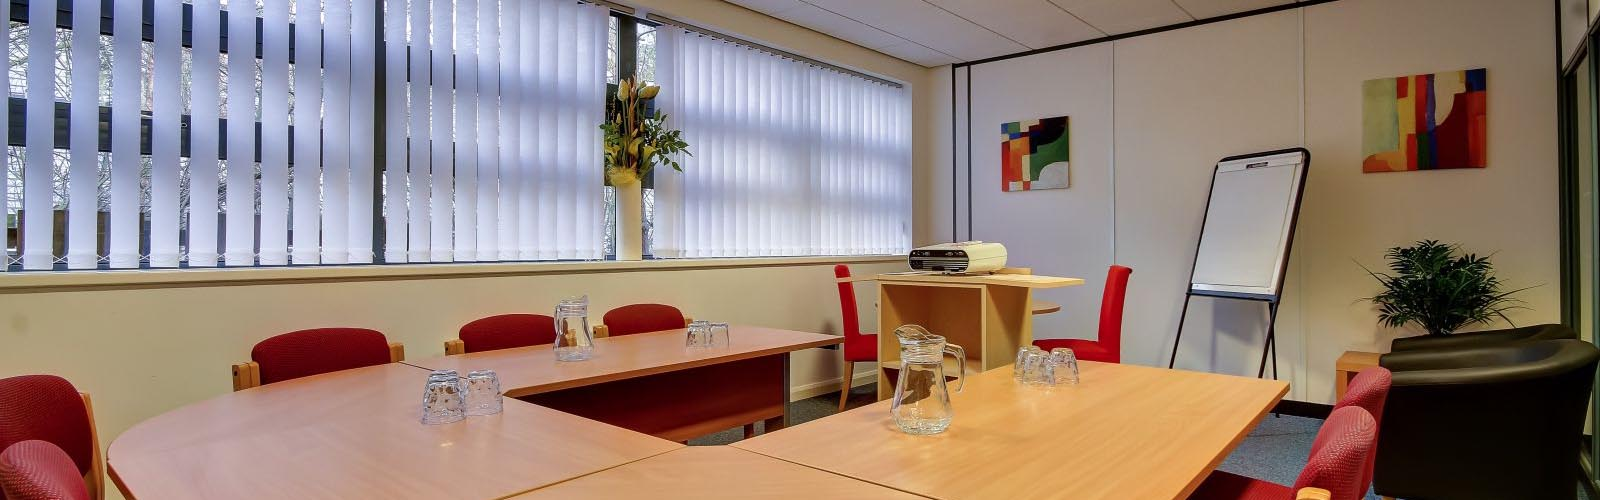 Seminar and training room hire in Durham, UK